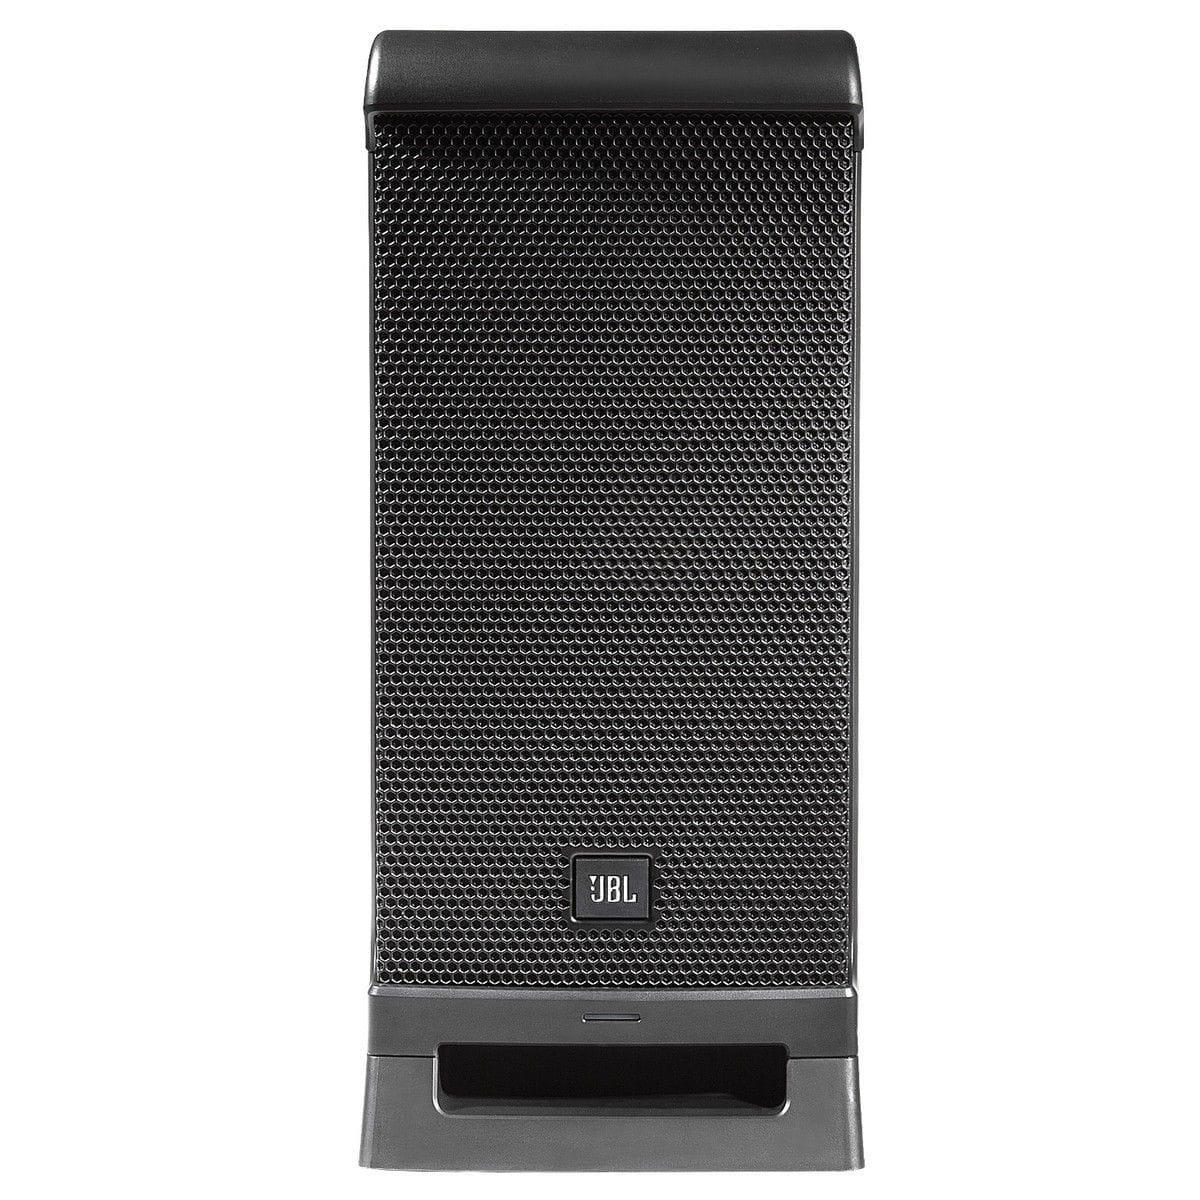 JBL Sistema de P.A Portátil EON ONE PRO (250w RMS/Mixer 7 Canais/Bateria Recarregável)